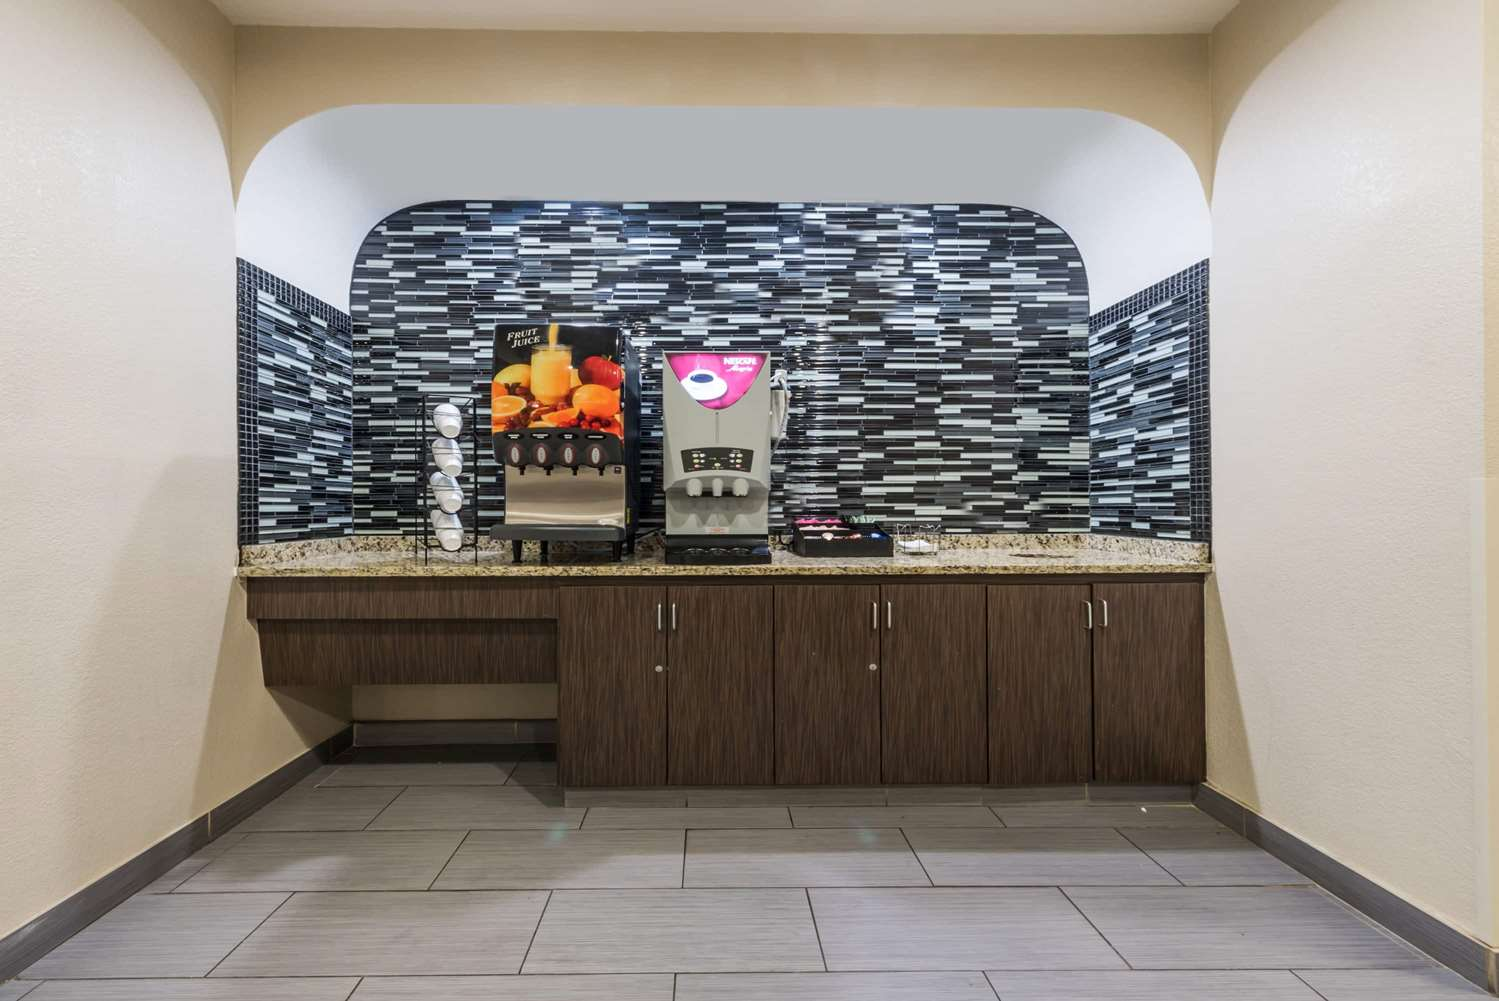 proam - Microtel Inn & Suites by Wyndham North Fort Worth